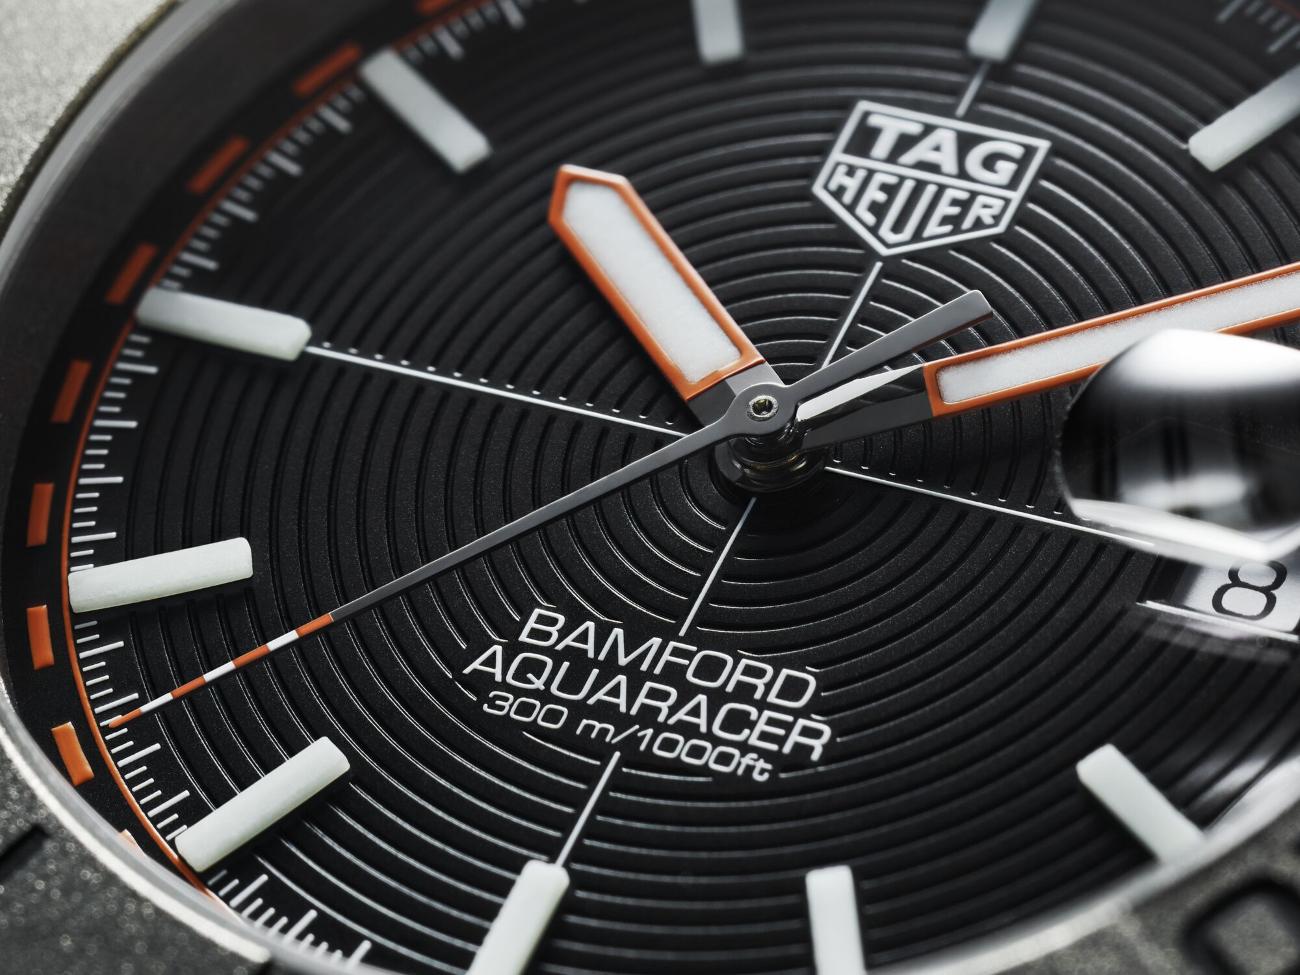 TAG_heuer_bramford_close-_europa_star_watch_magazine_2020